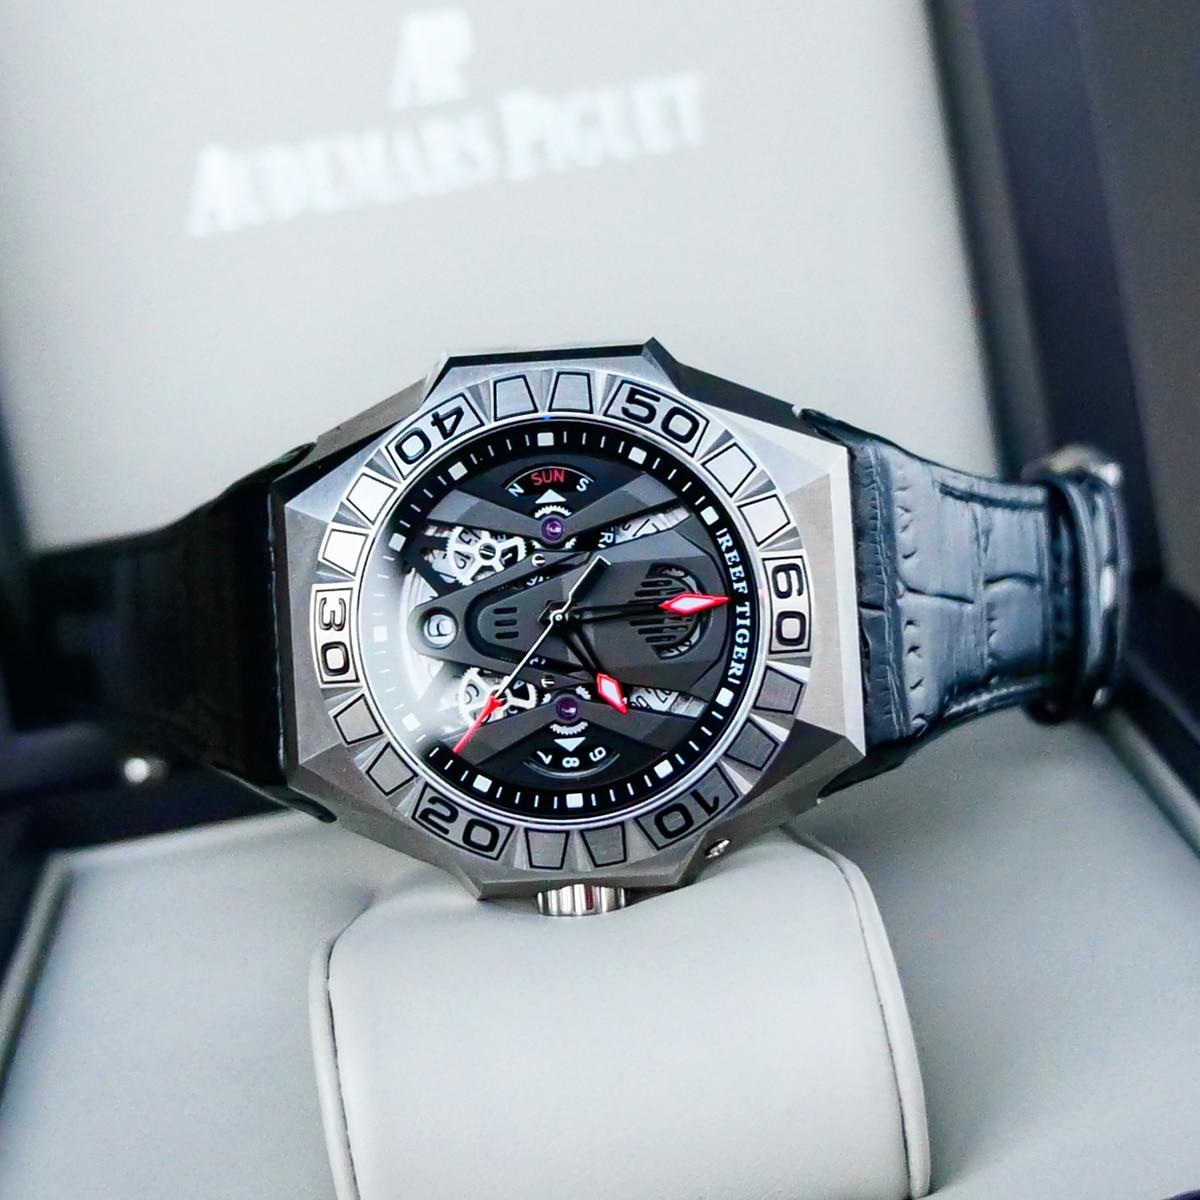 Reef Tiger/RT Top Brand Men Sport Watches Automatic Skeleton Watch Steel Waterproof Leather Strap Relogio Masculino RGA6912 5